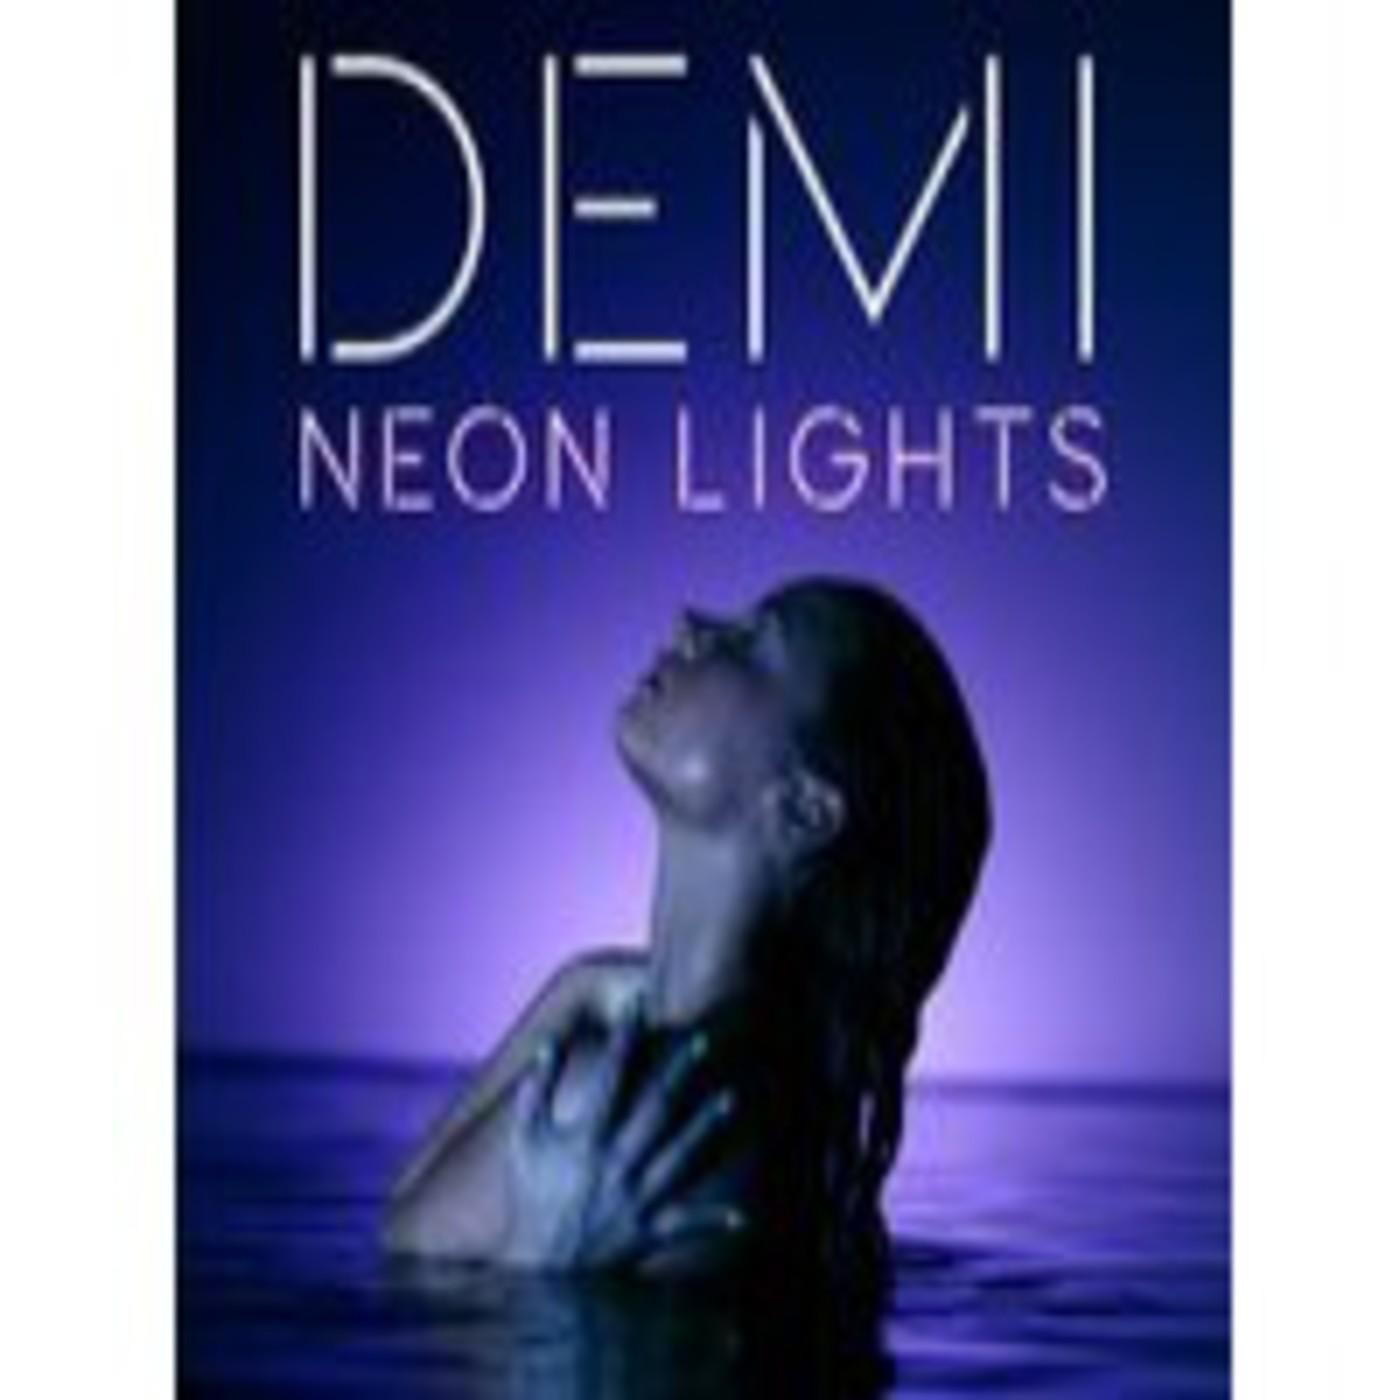 [9.3 MB] #Download Omd Neon Lights Mp3 Free